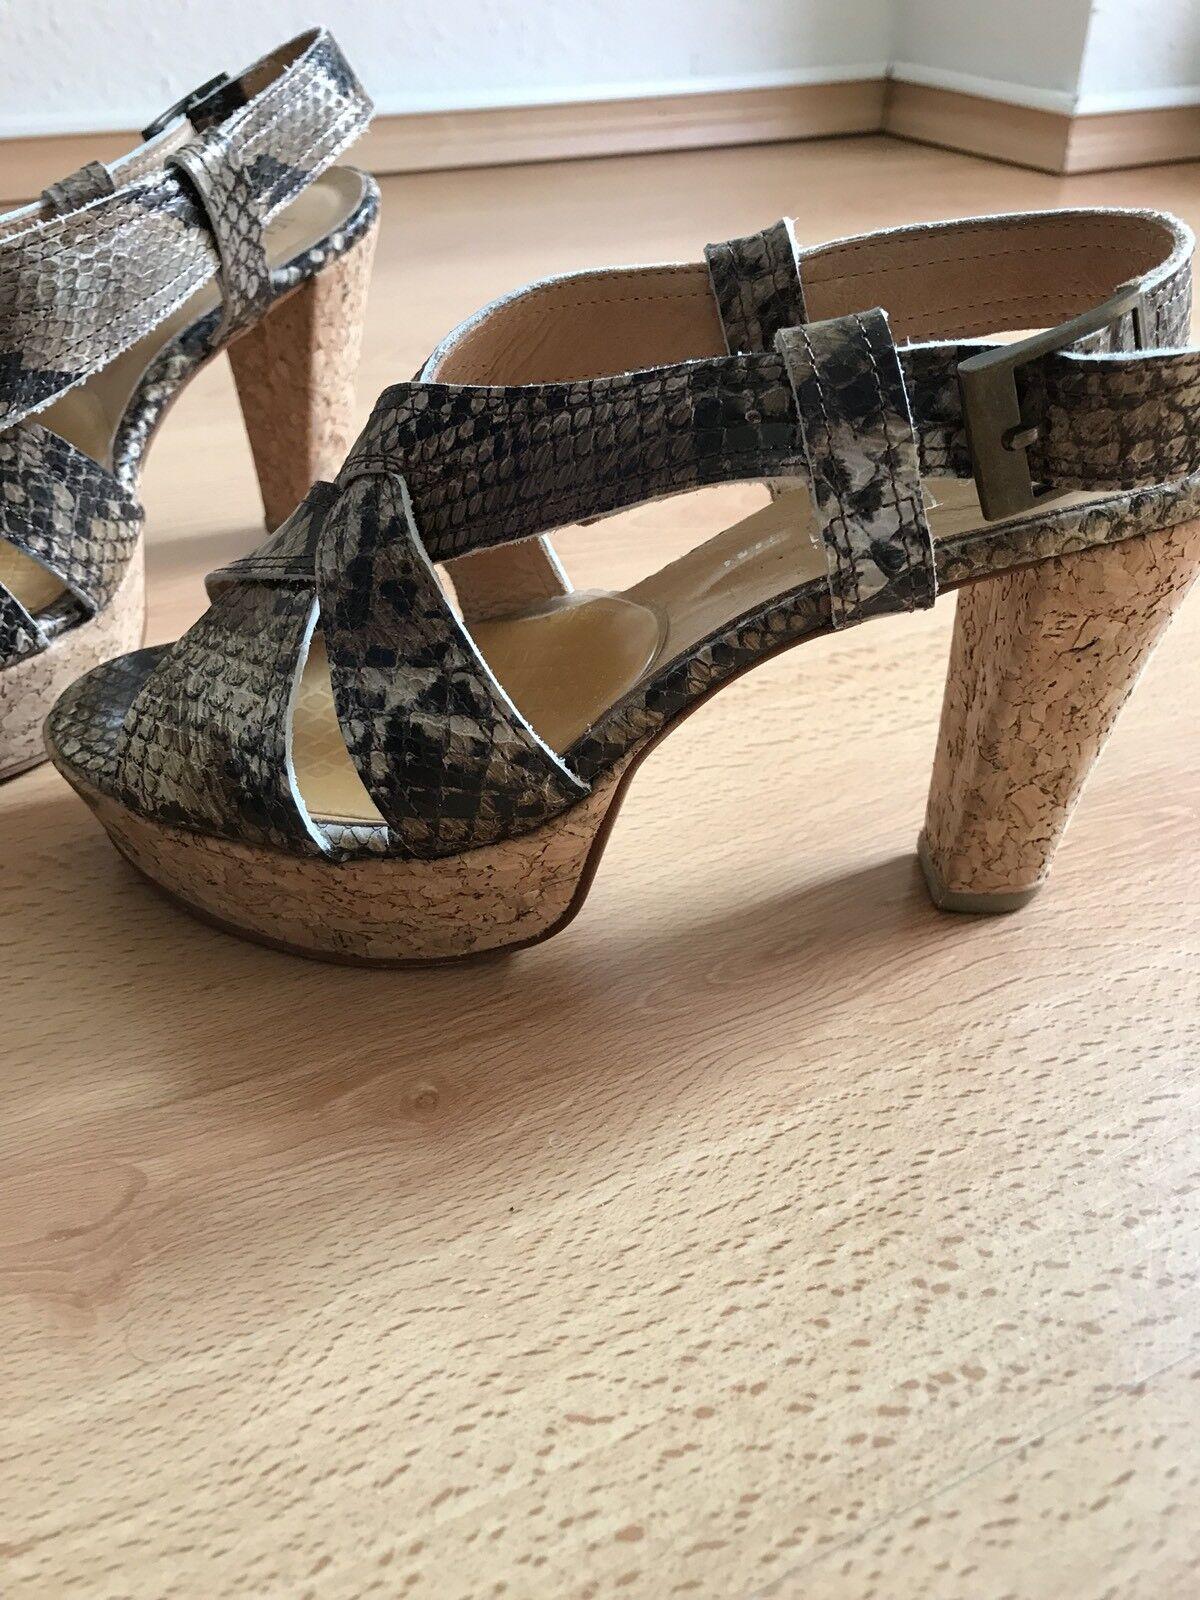 Valerie Perrini Damen Damen Damen Pumps Schuhe Pythonleder Neupreis e0b21b